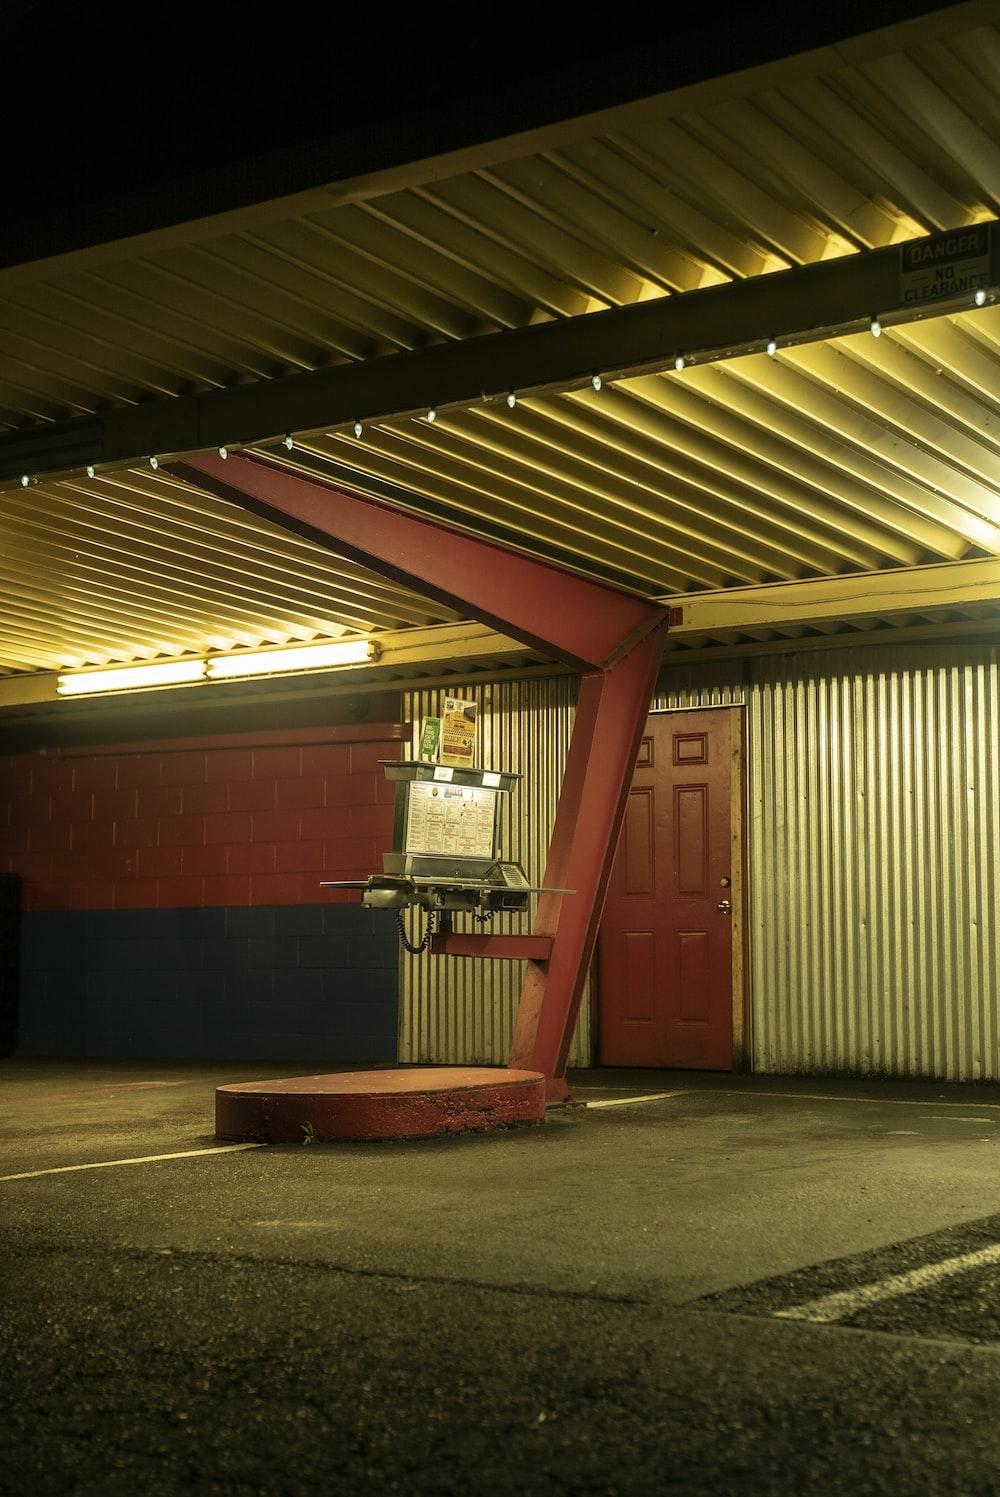 red and white garage door